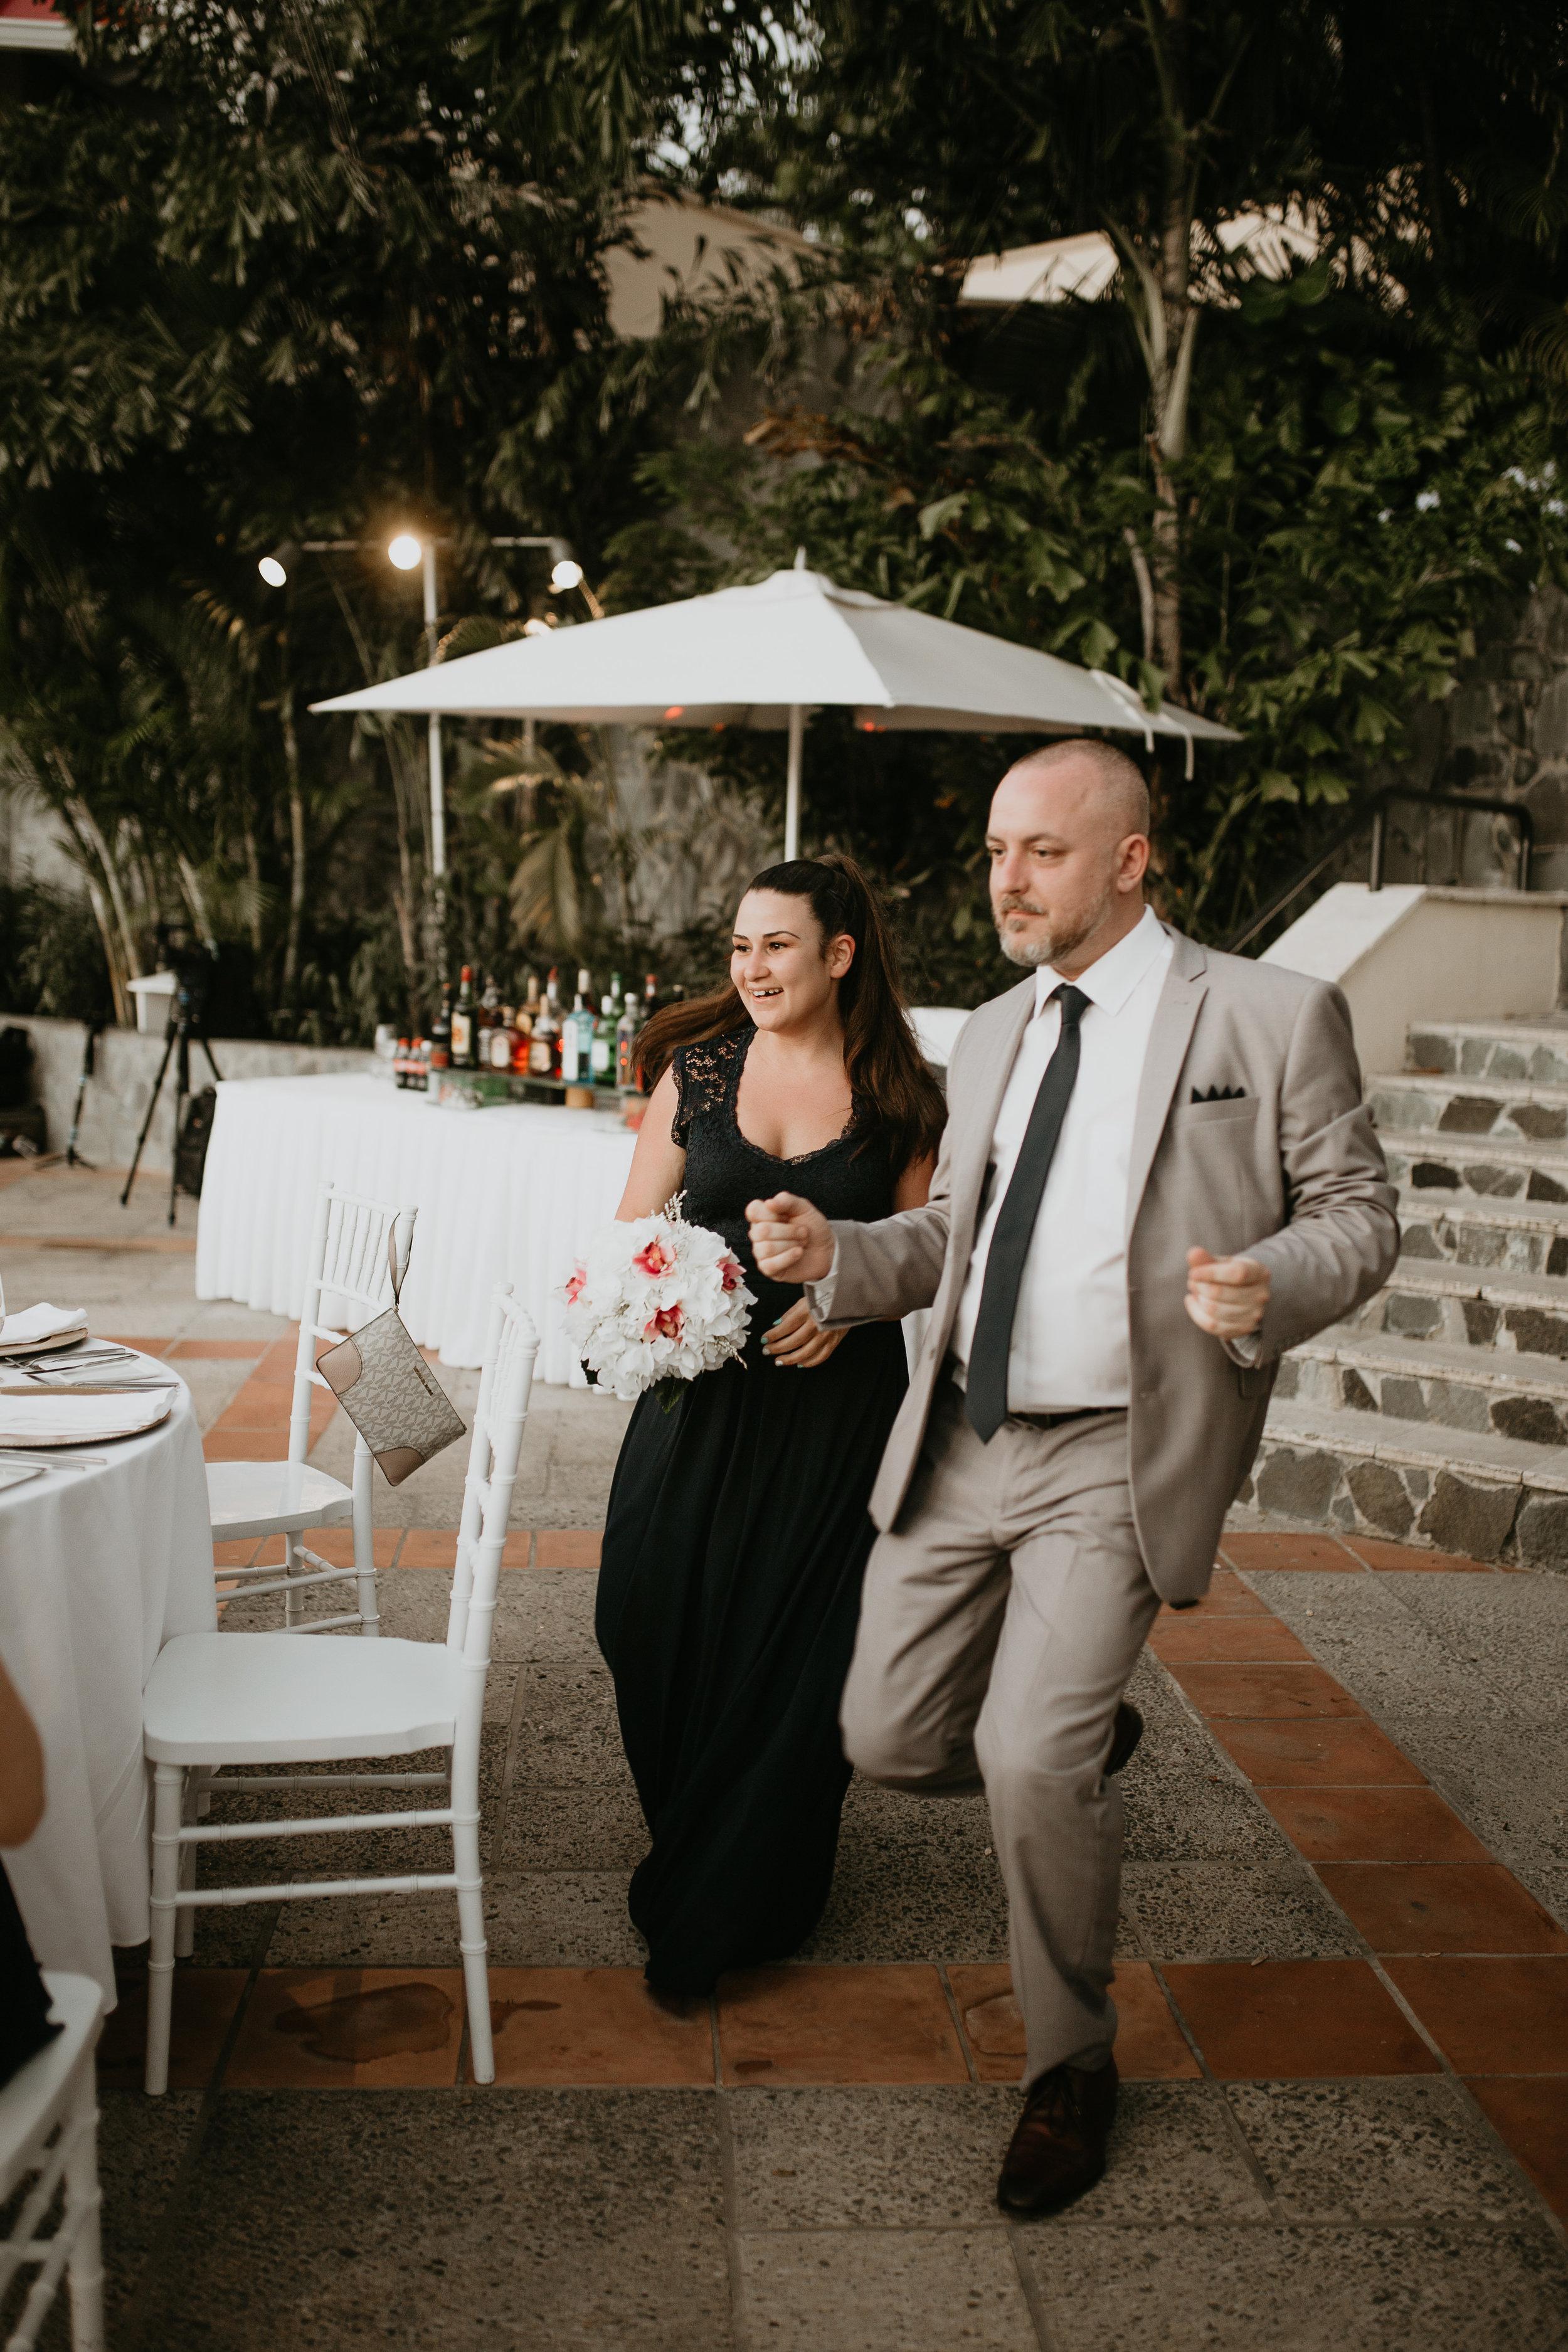 nicole-daacke-photography-destination-wedding-in-st-lucia-sandals-la-toc-intimate-island-wedding-carribean-elopement-photographer-chill-island-wedding-126.jpg